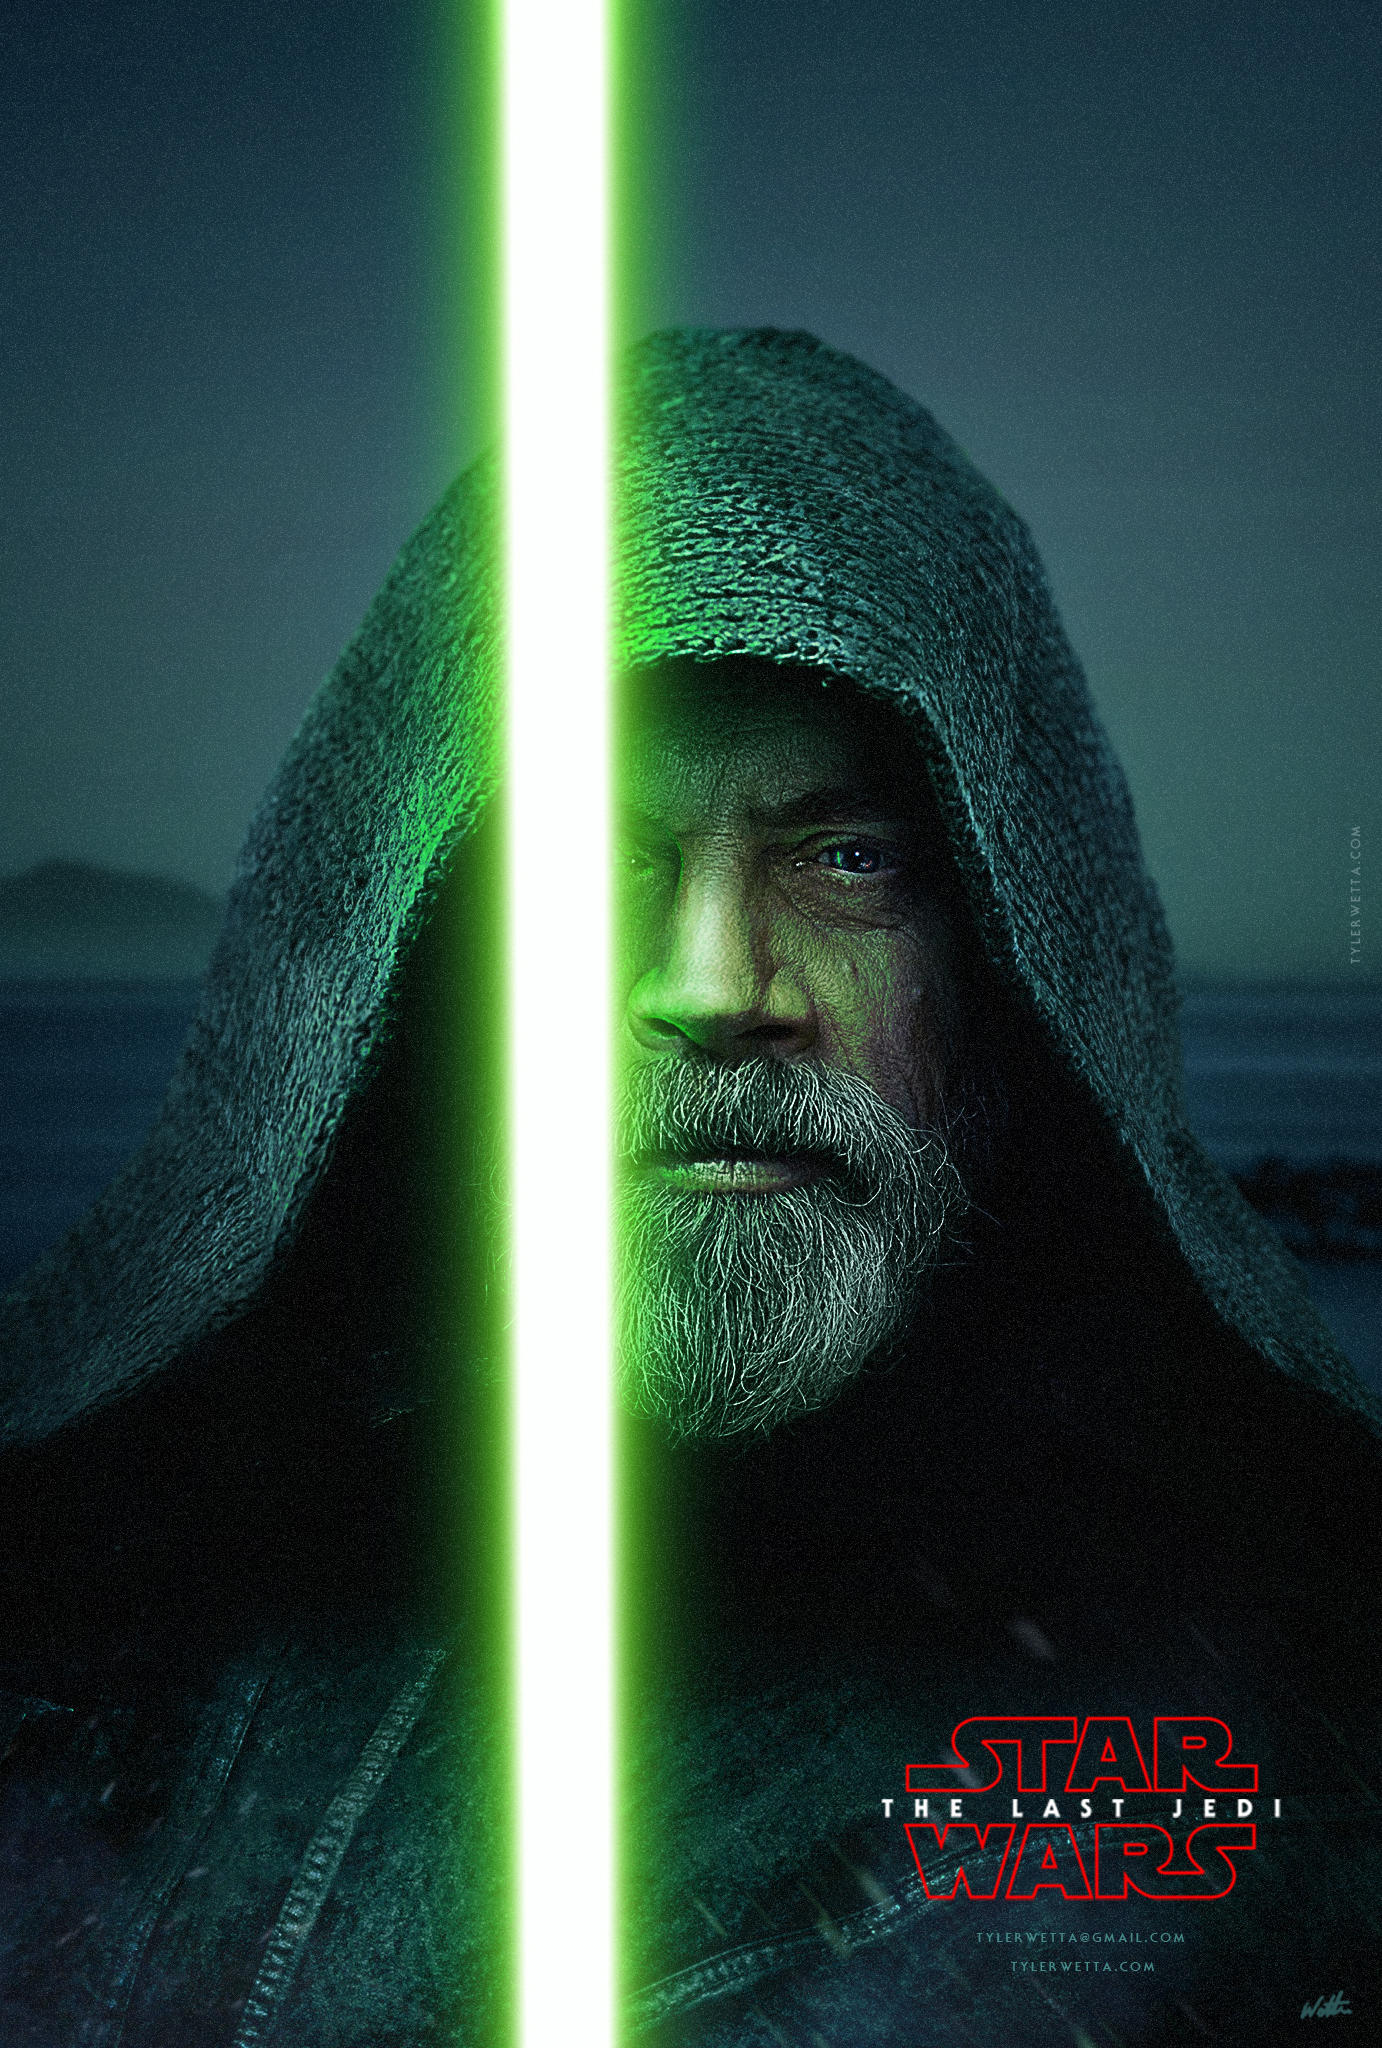 The Last Jedi Movie Poster by tyler-wetta